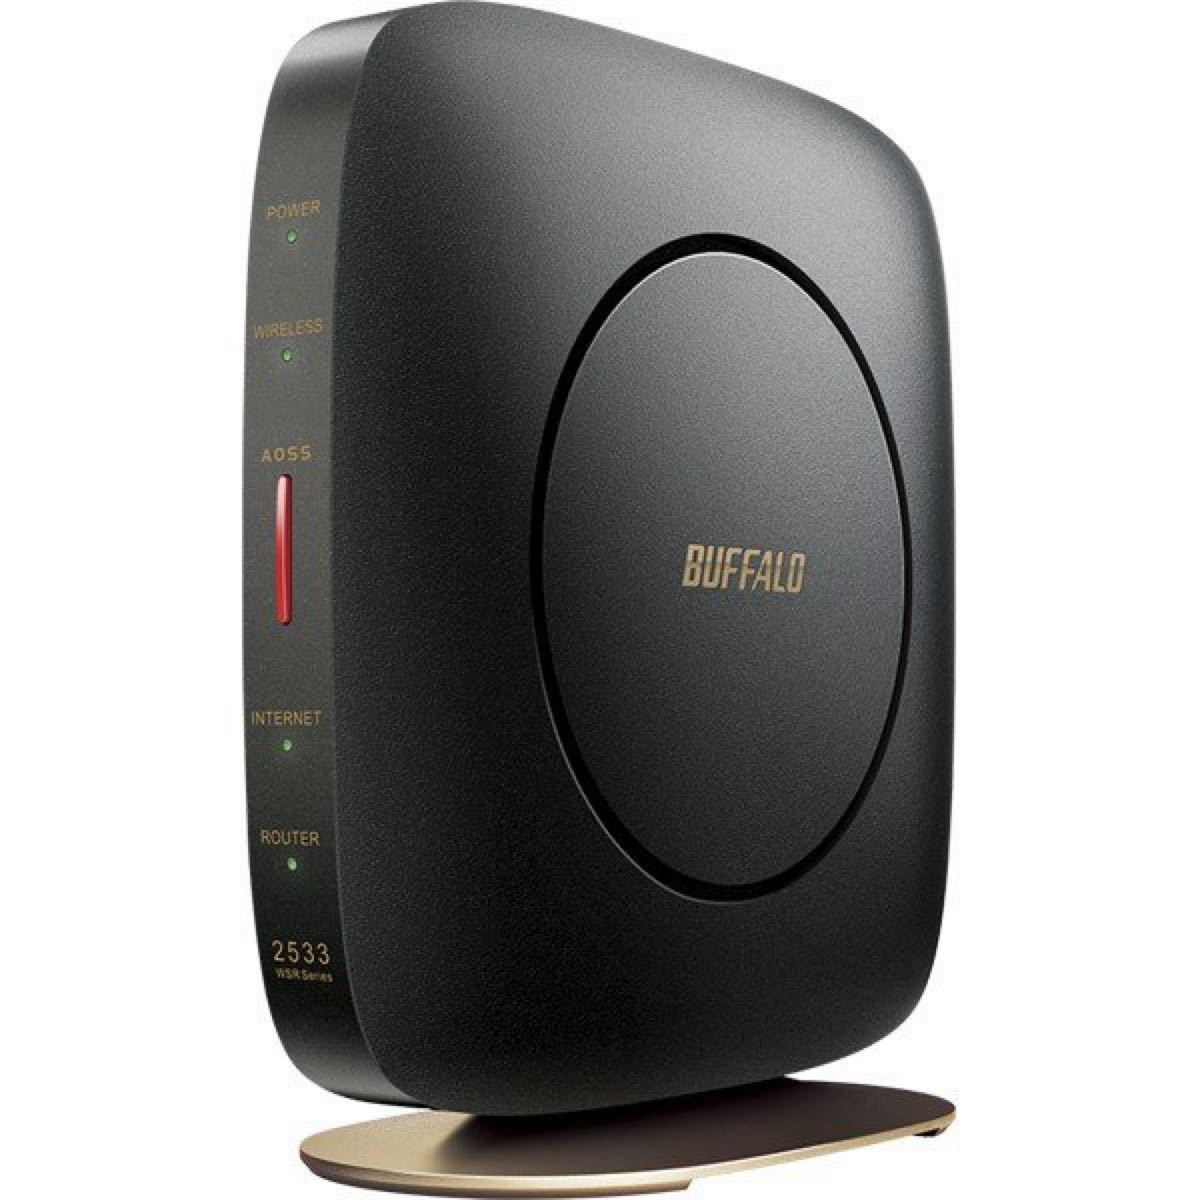 BUFFALO WSR-2533DHP2-CB 無線LANルーター